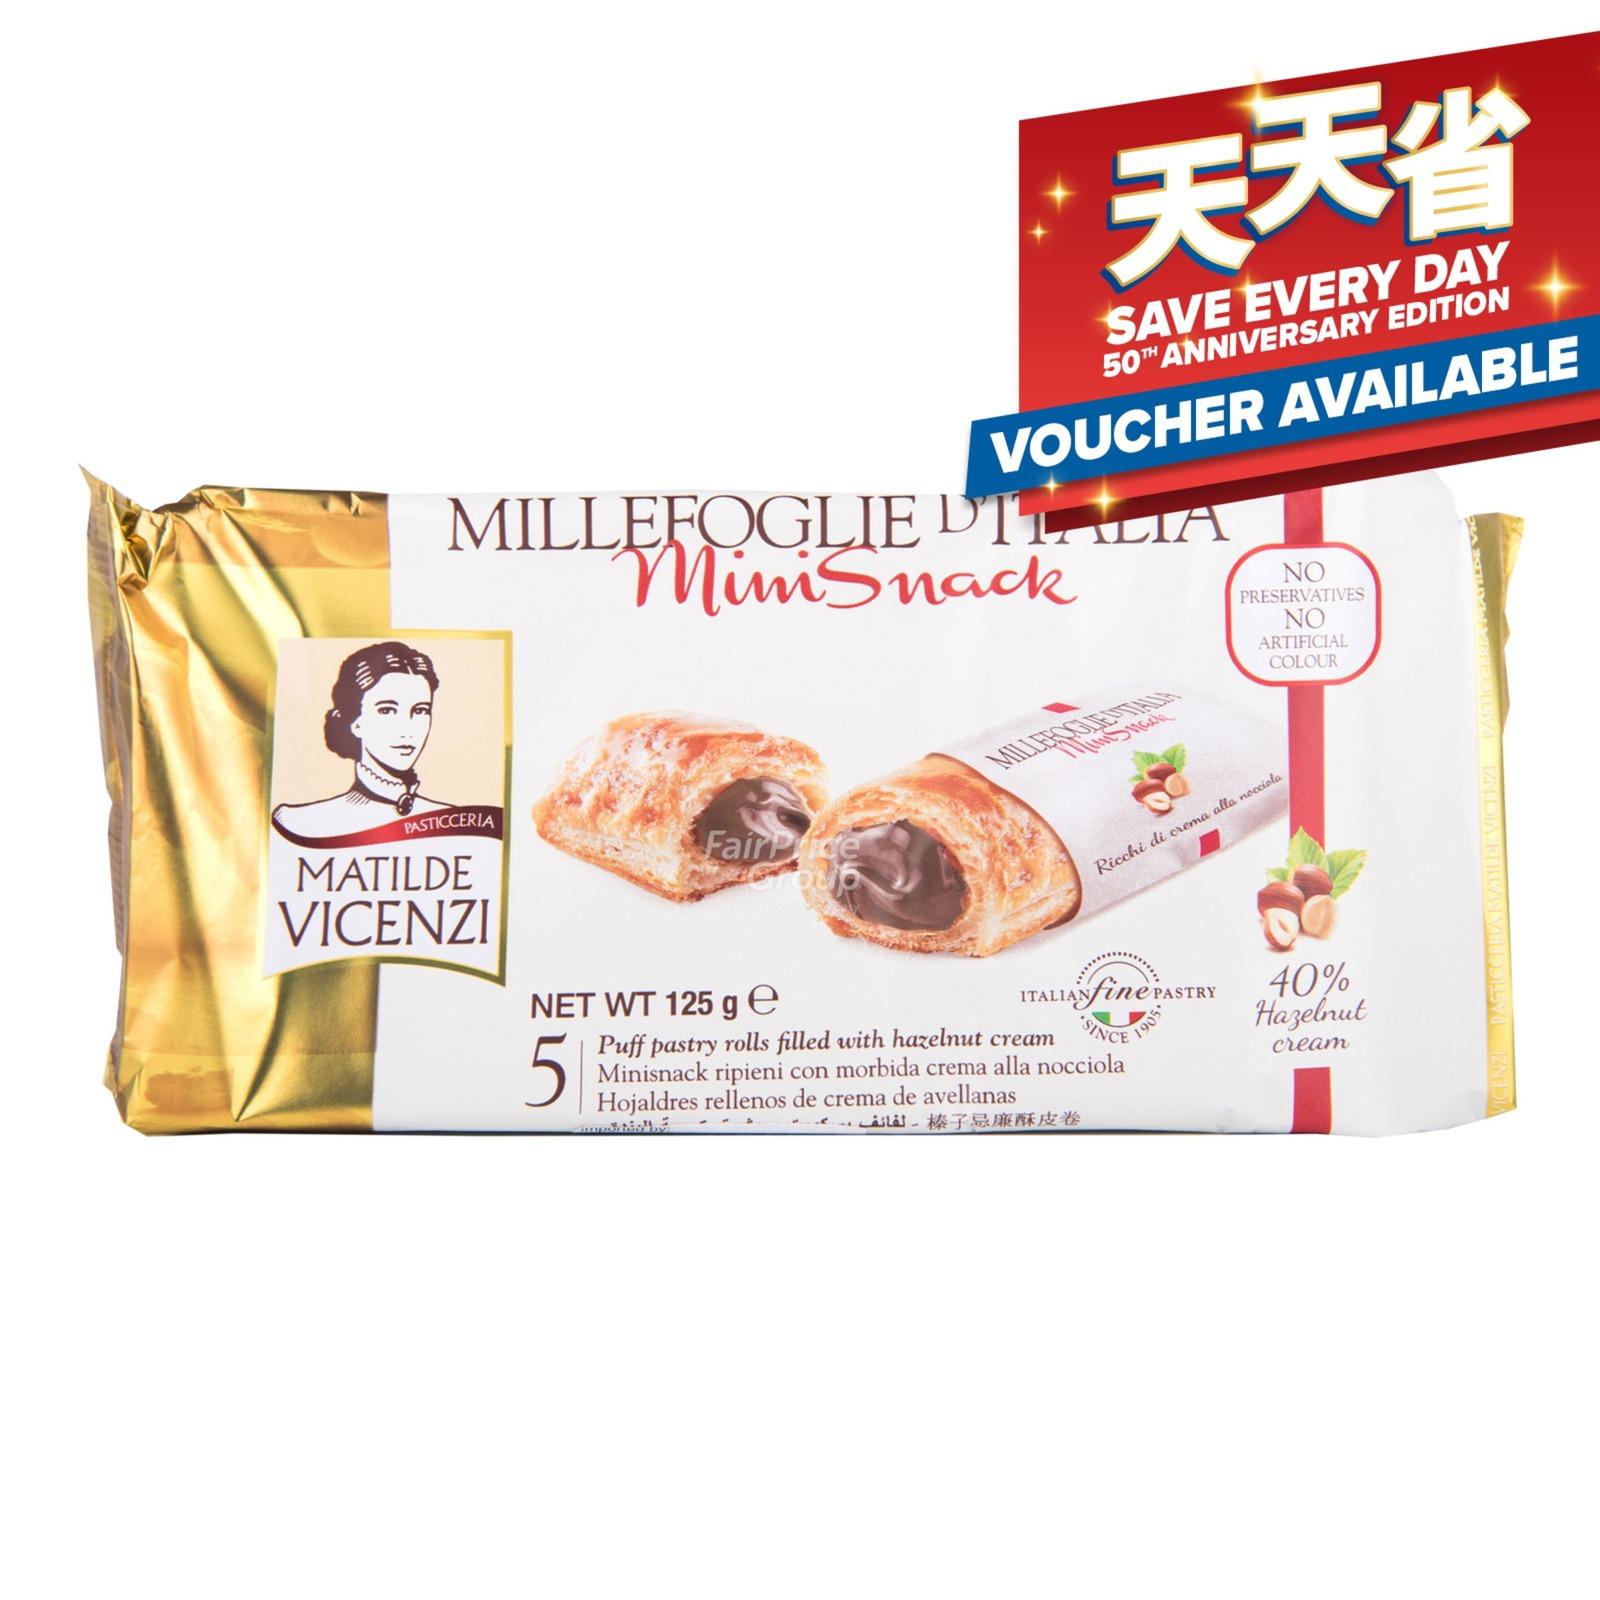 Vicenzi Millefoglie Puff Pastry Roll - Minisnack (Hazelnut)